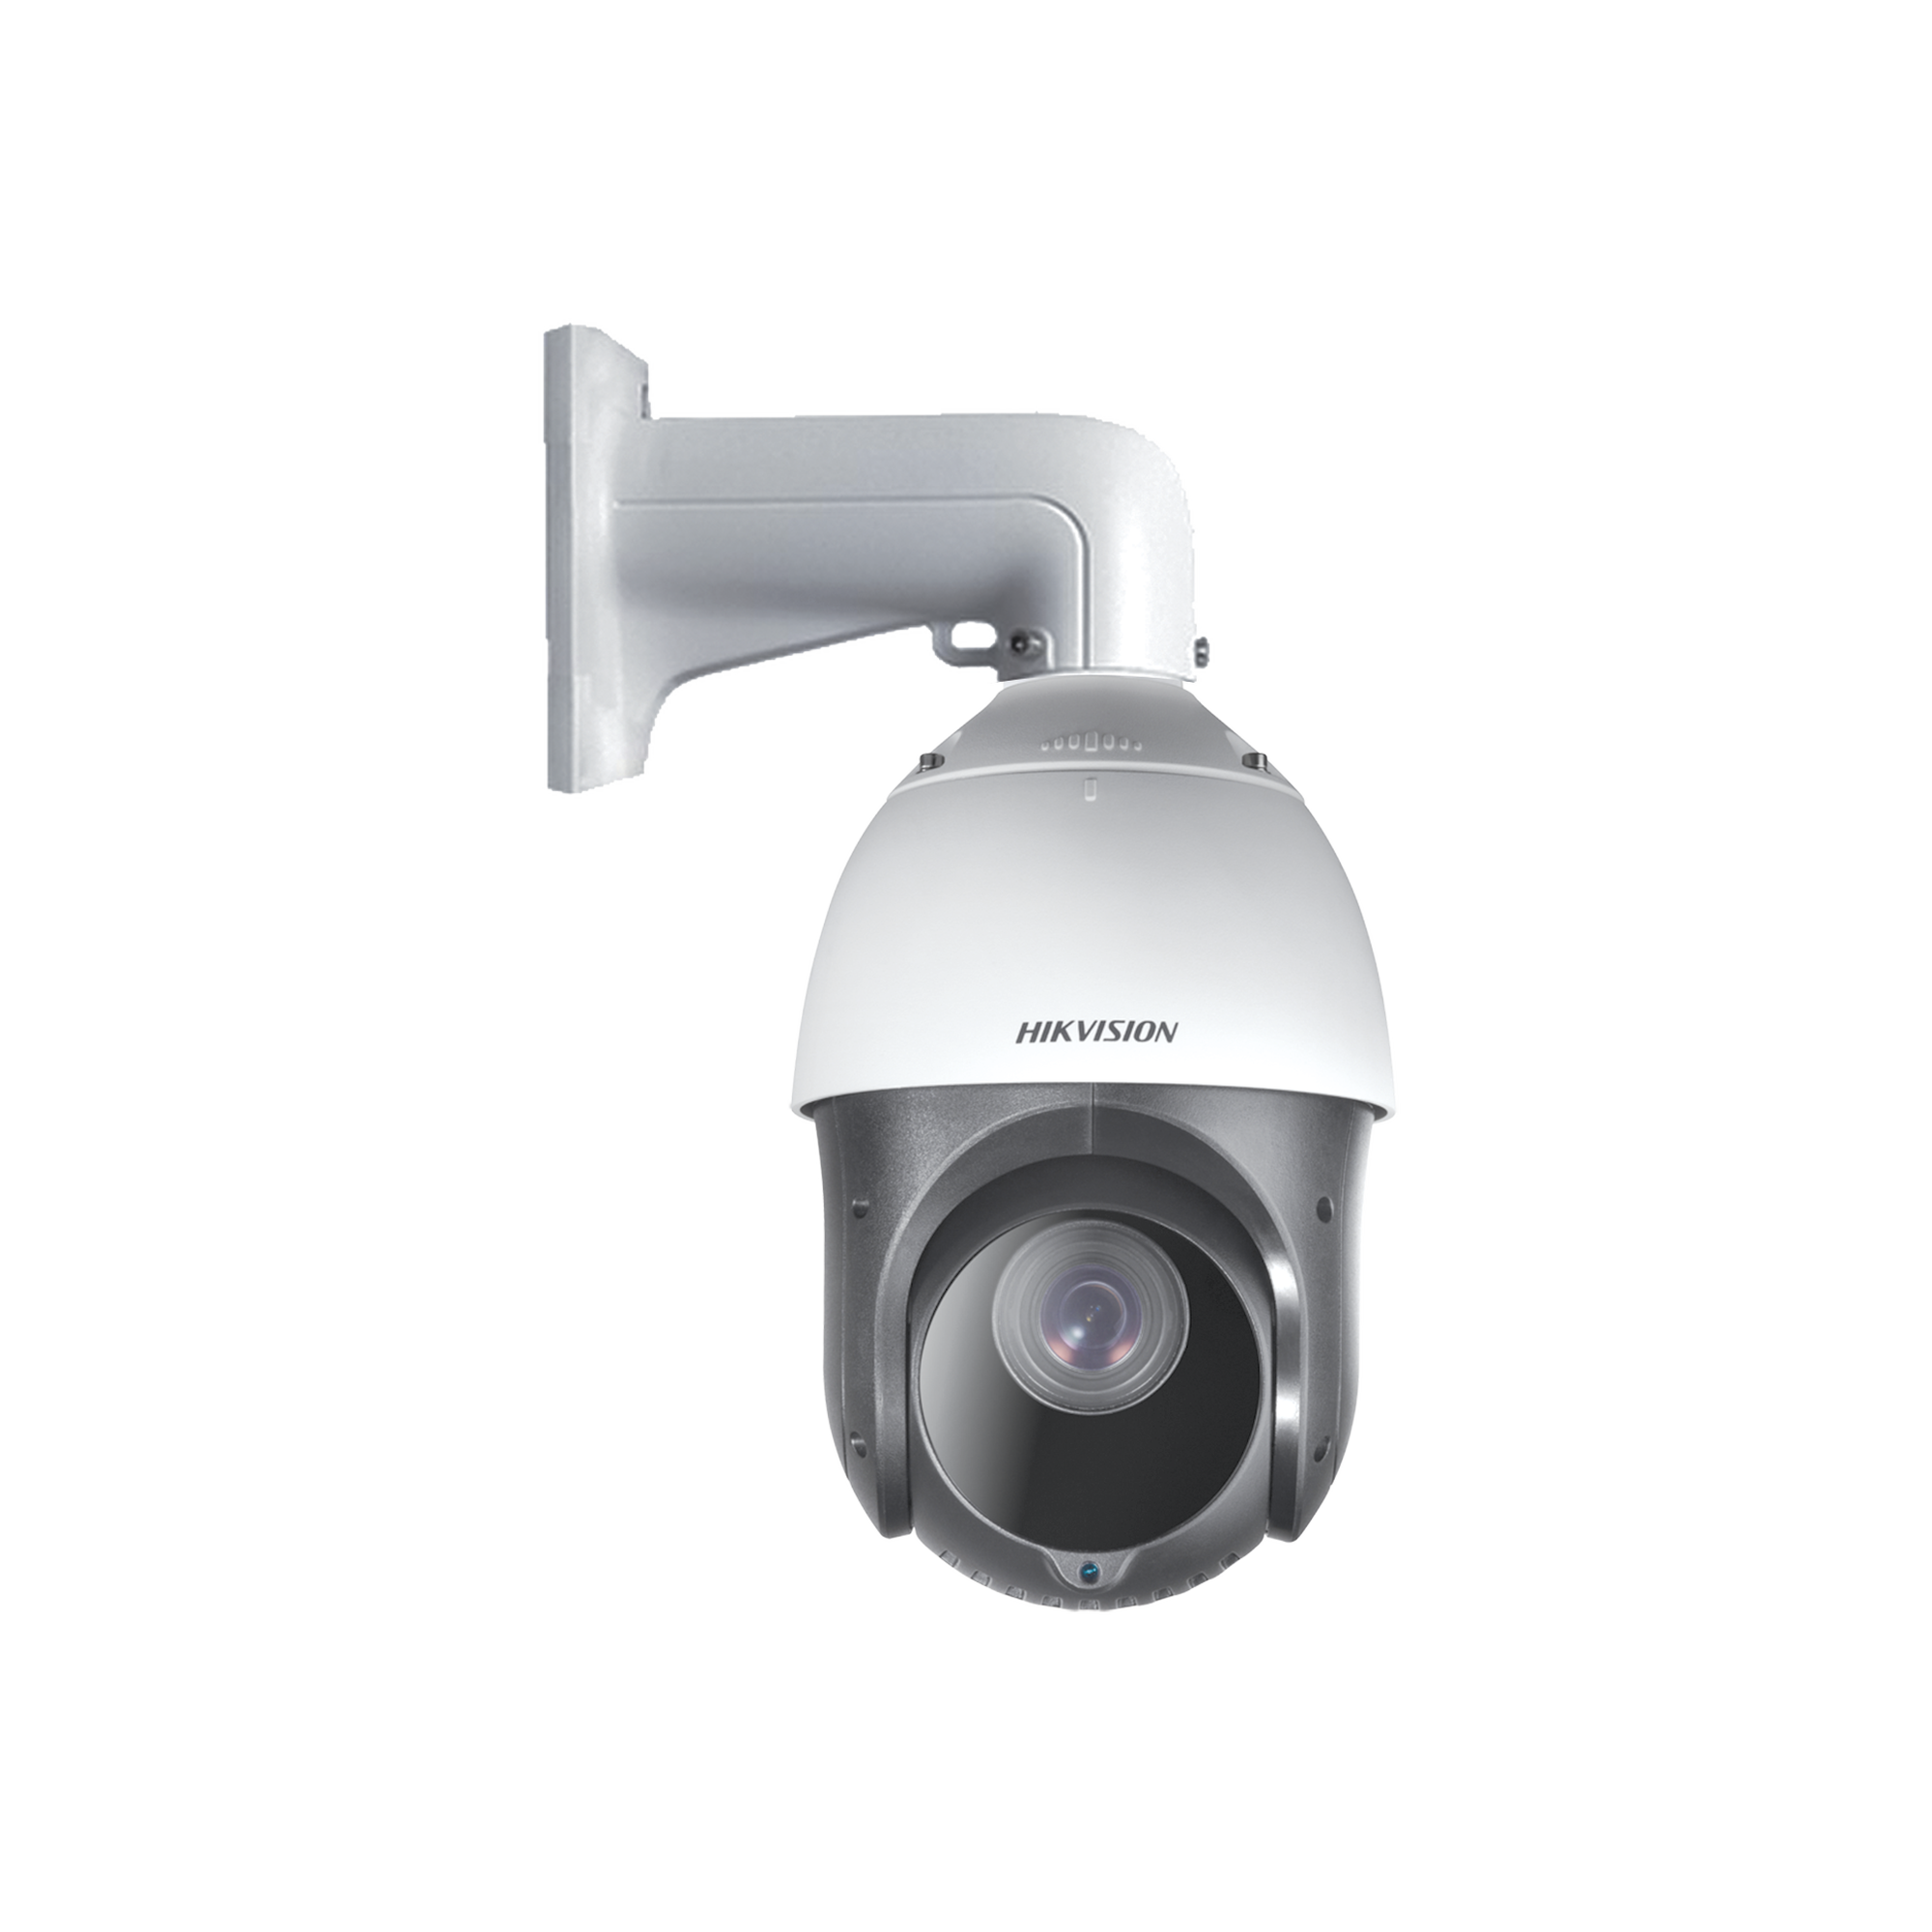 Domo PTZ TURBOHD 720P / 23X Zoom / 100 mts IR / Exterior IP66 / dWDR / Soporta Salida Analógica / RS-485